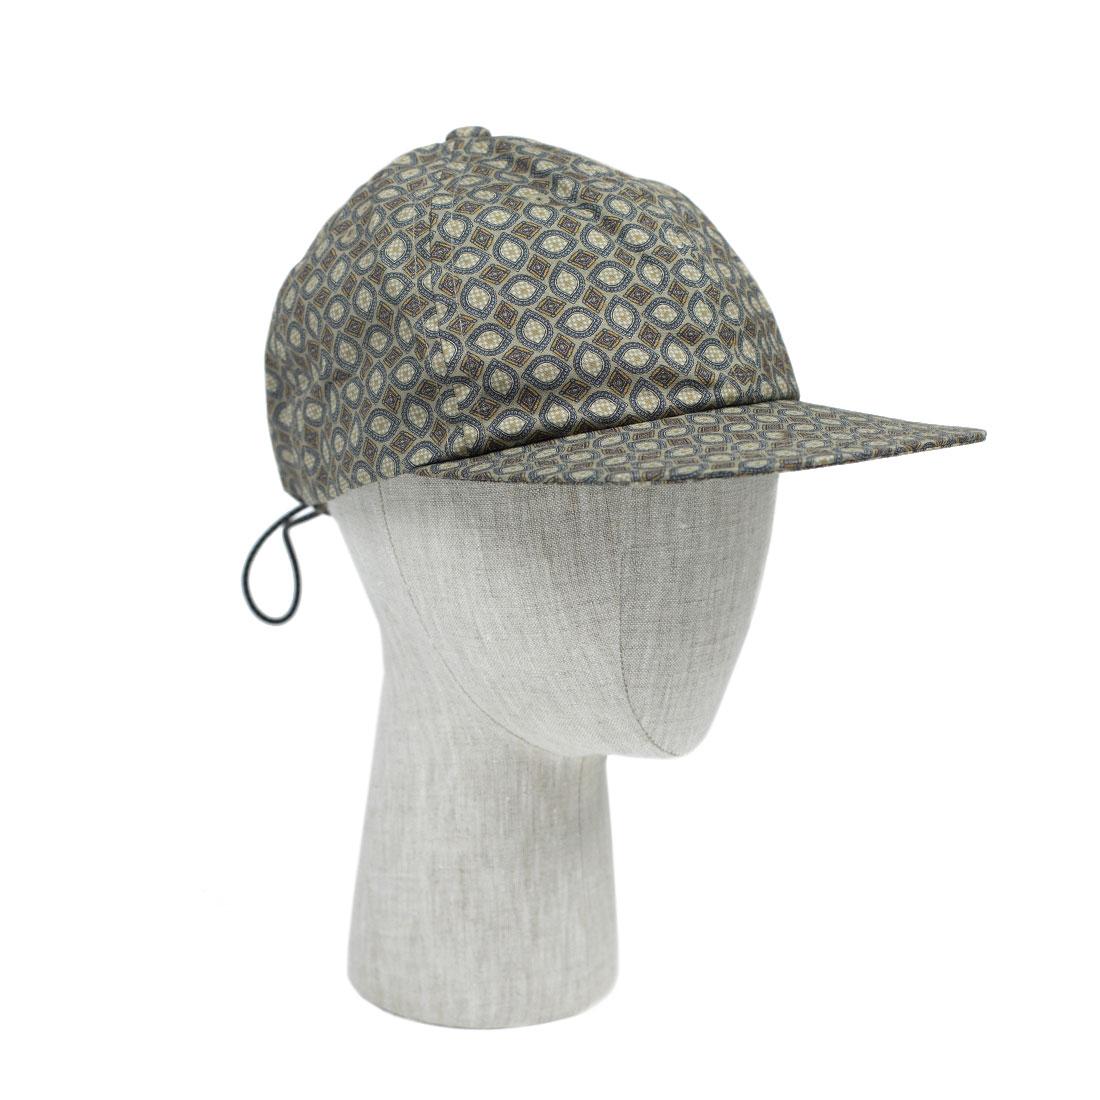 Sublime Hats Spring Summer 2021 SS21 Made in Japan carry loop printed cap (9).jpg